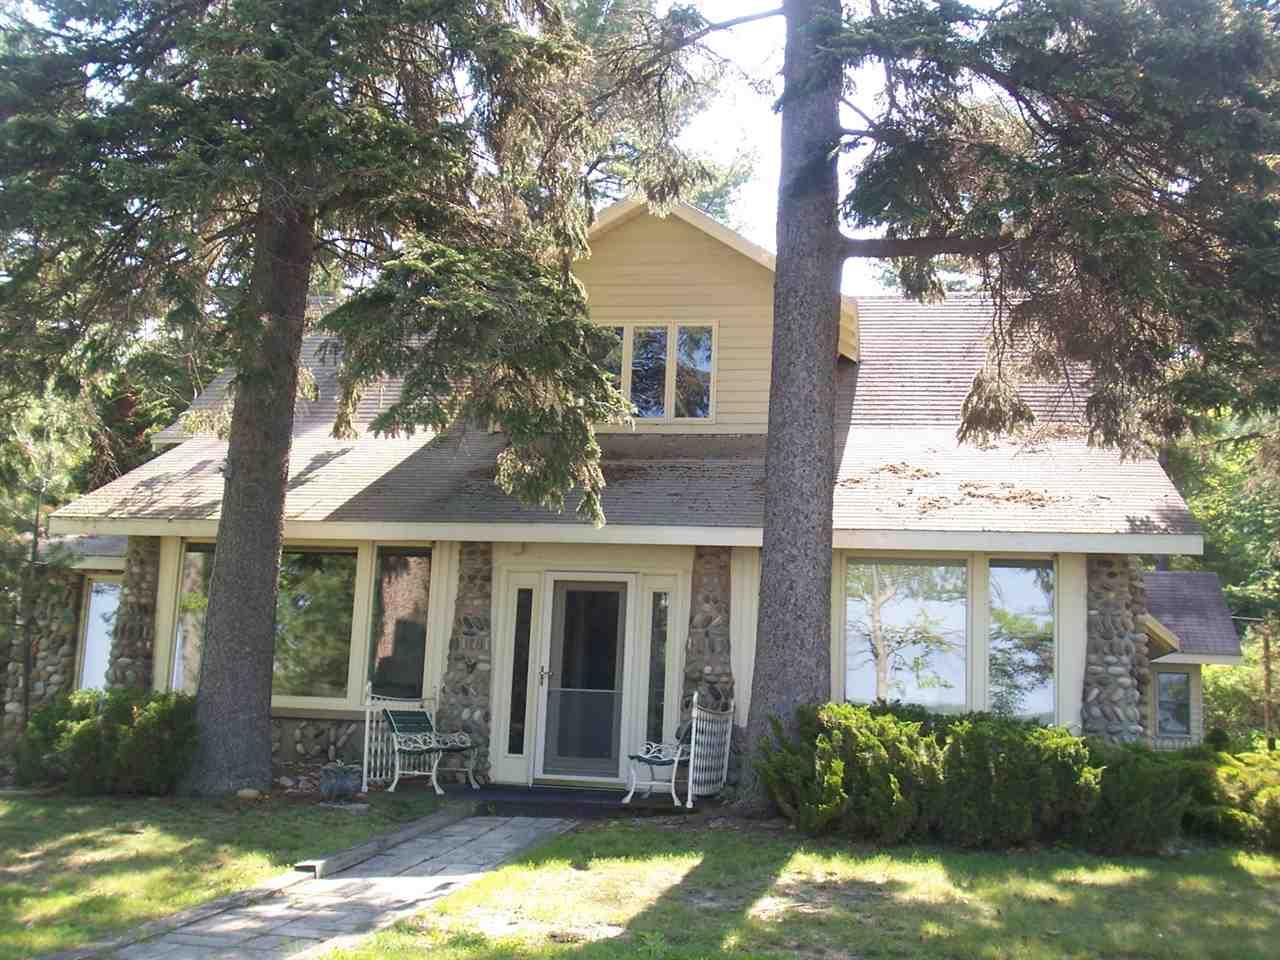 Real Estate for Sale, ListingId: 20588686, Roscommon,MI48653